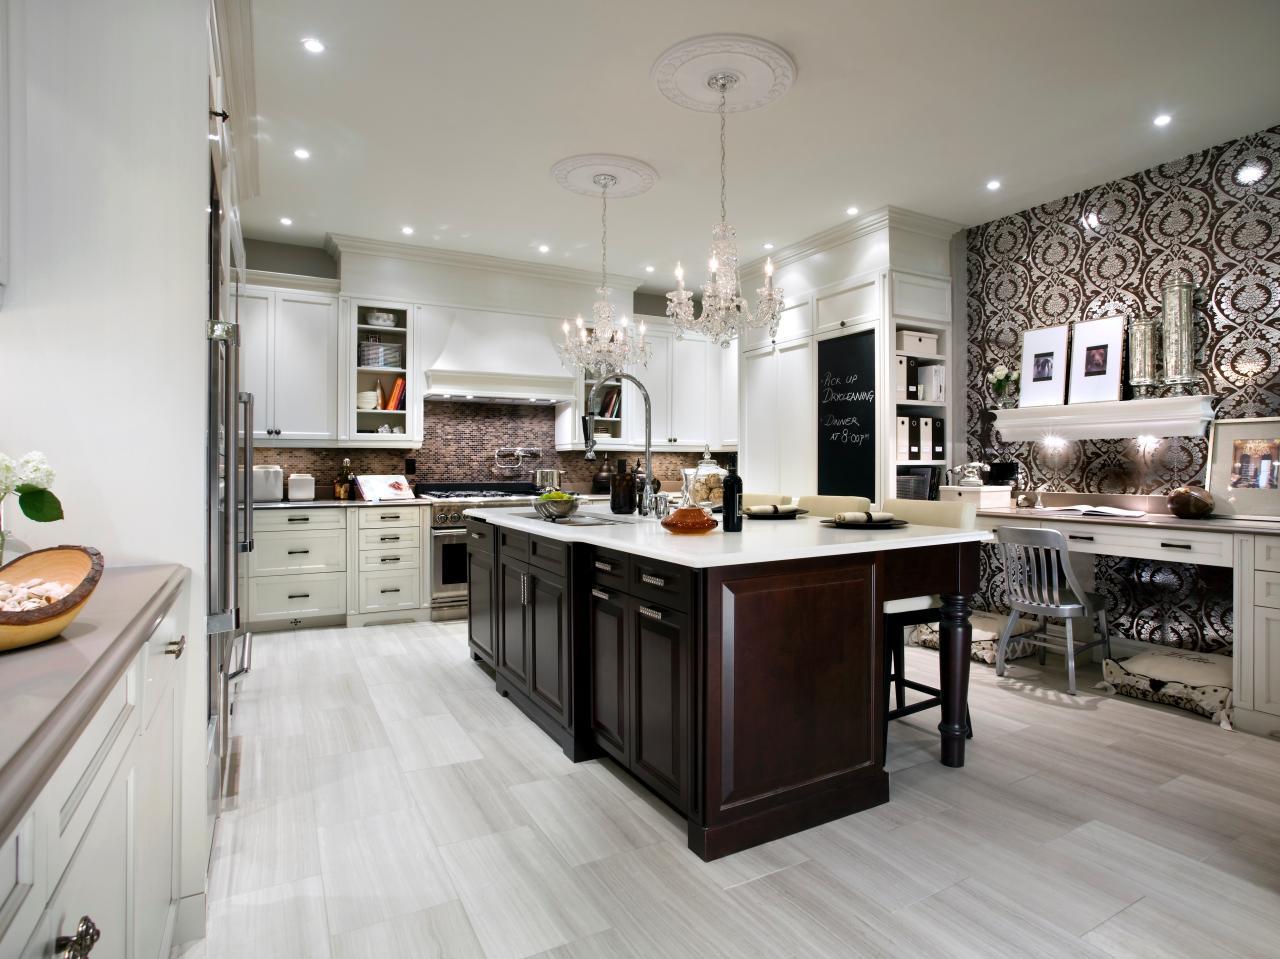 candice olson kitchen cabinets photo - 1